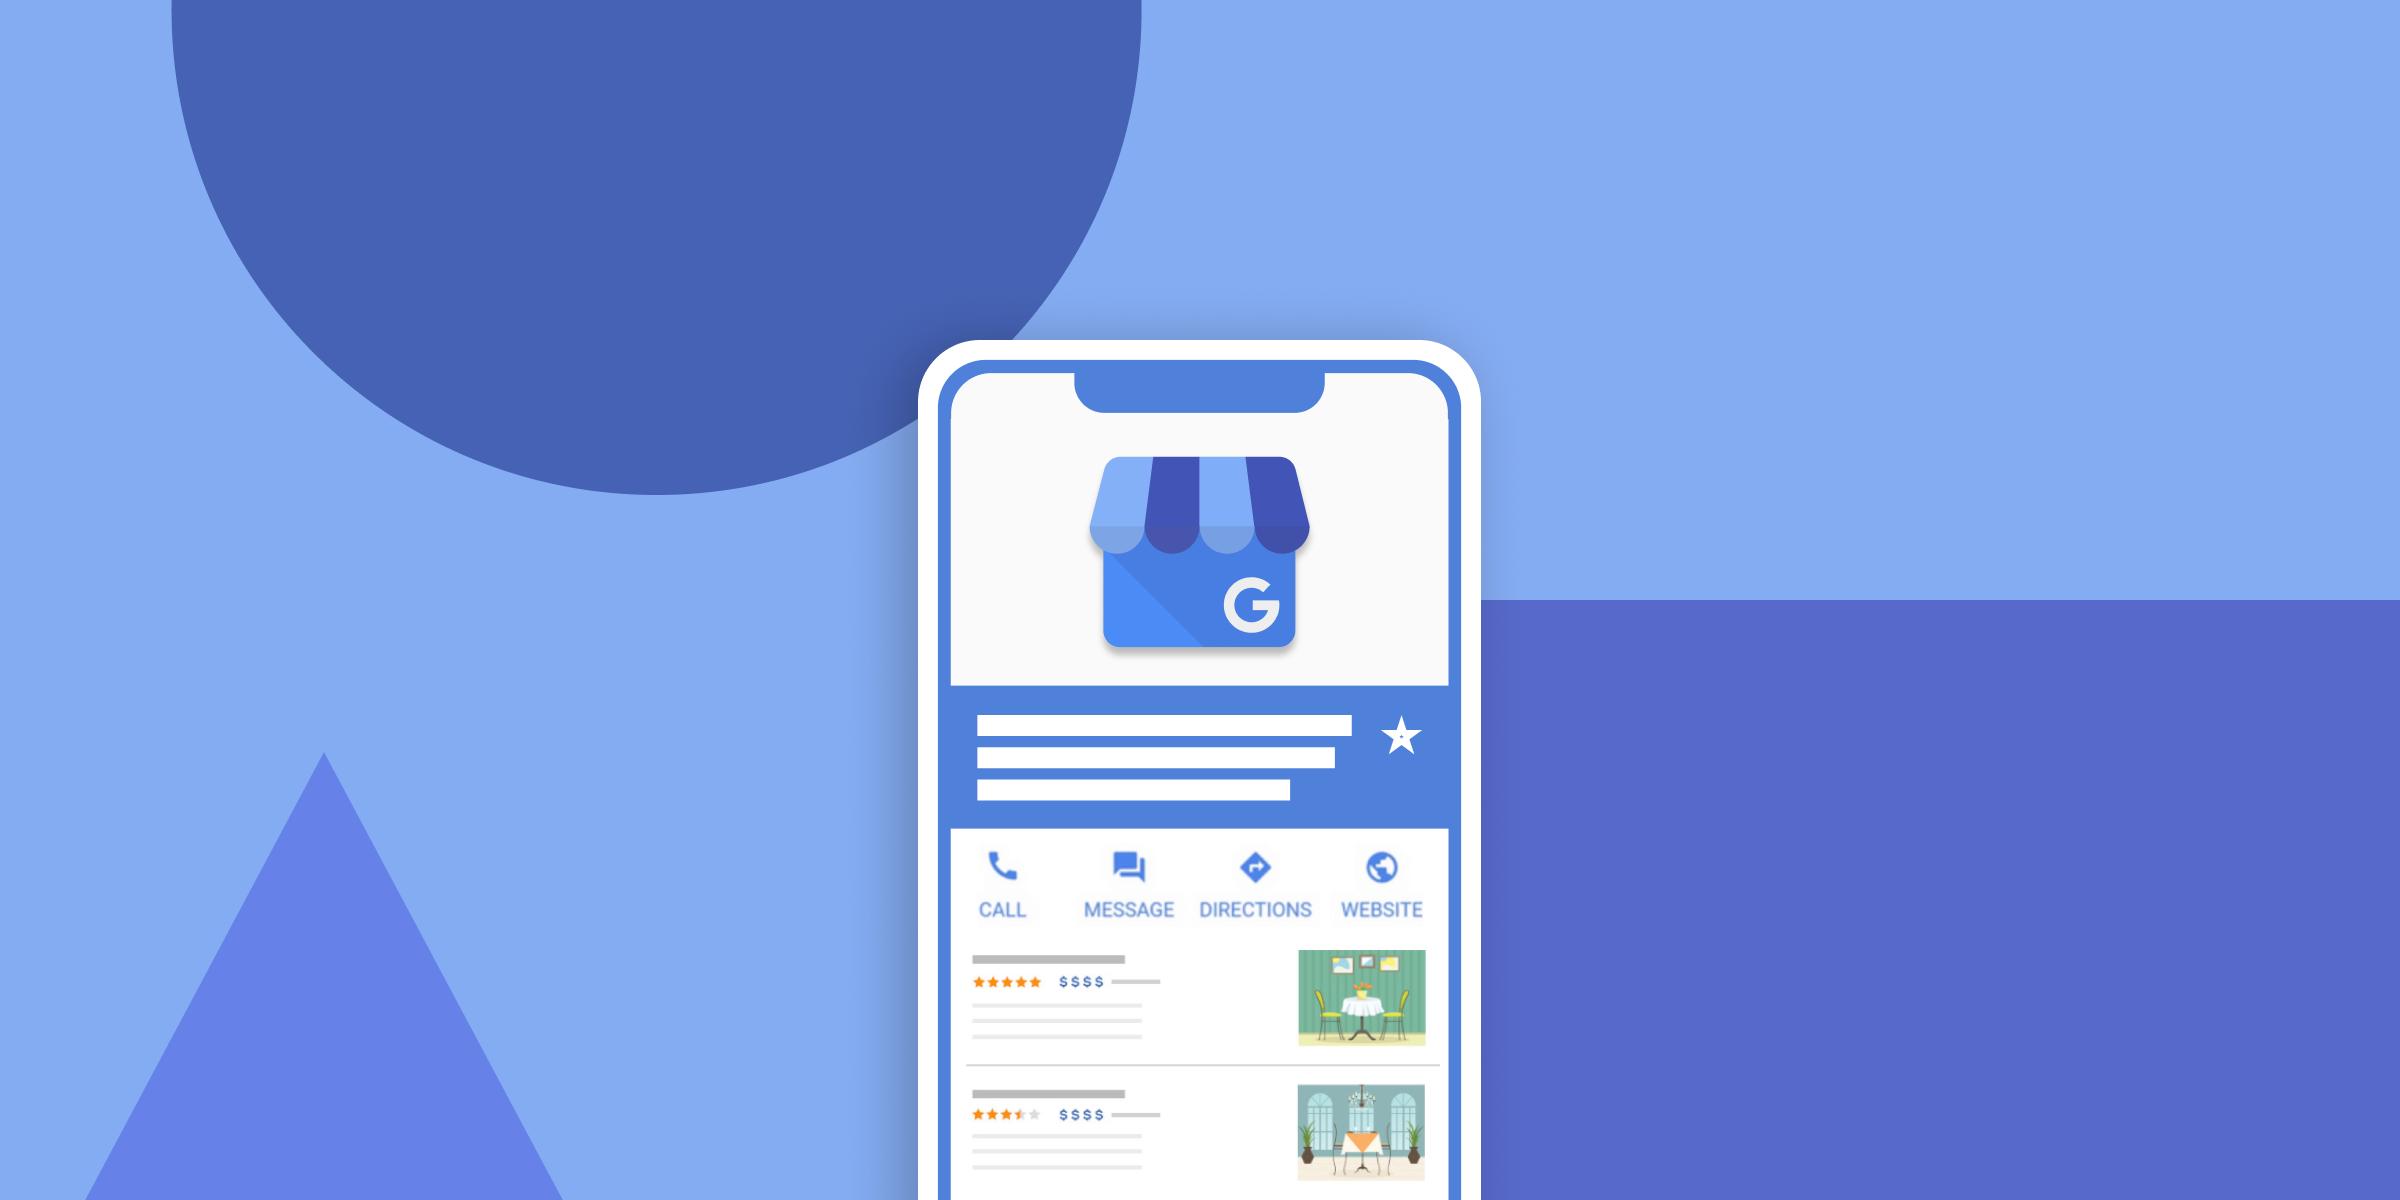 Google-My-Business-Profilinizi-Olusturma-Adimlari_blog-2